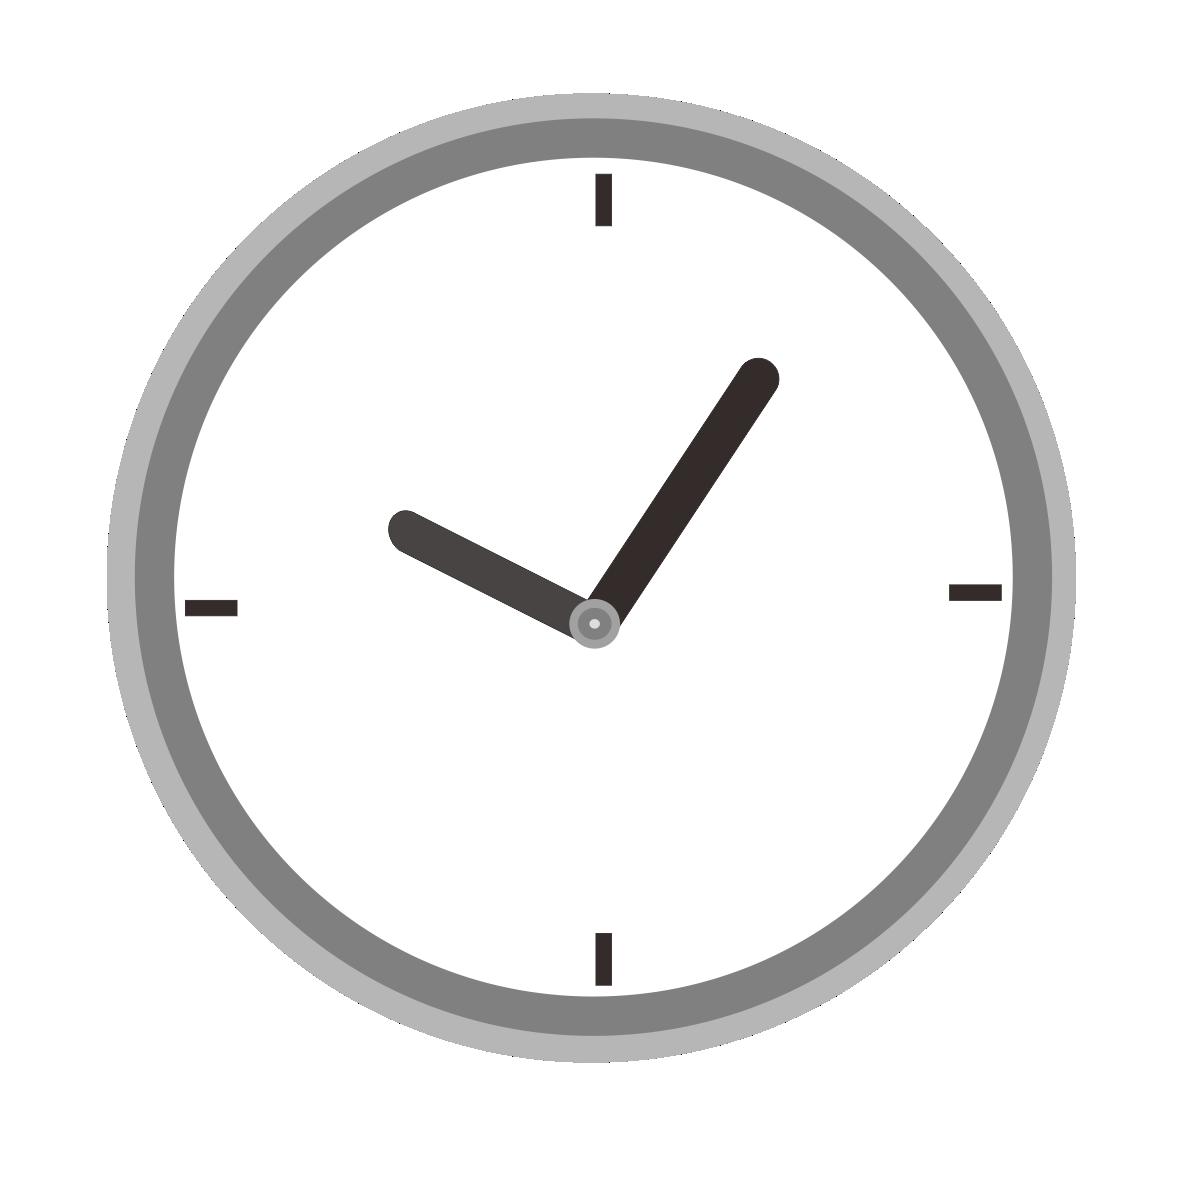 Pngtree—clock vector cartoon 3668551 - Eberick Para Projeto Estrutural